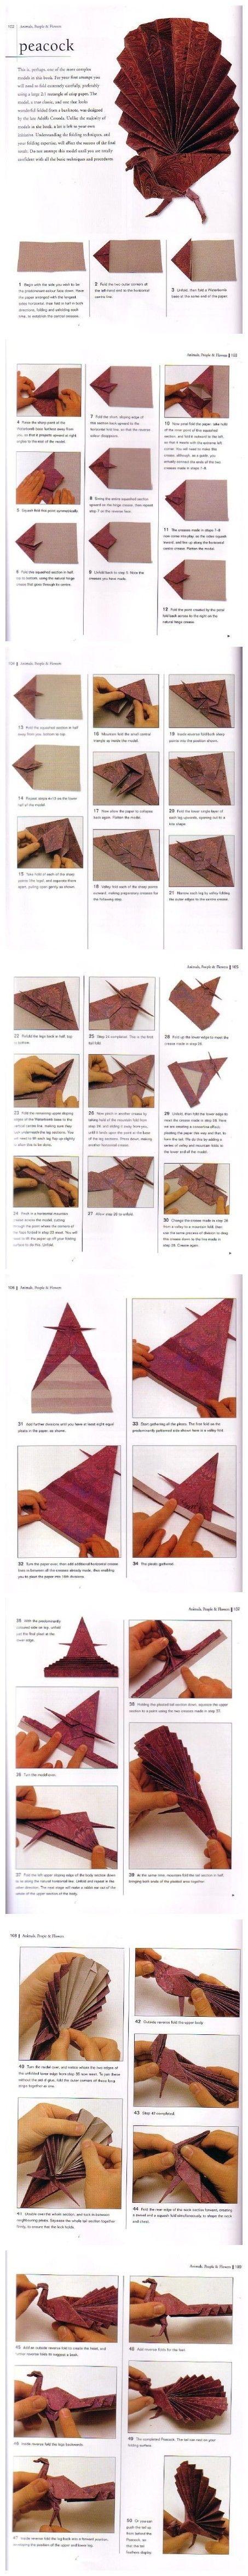 peacock #origami #paper #crafts #DIY #creative #cards